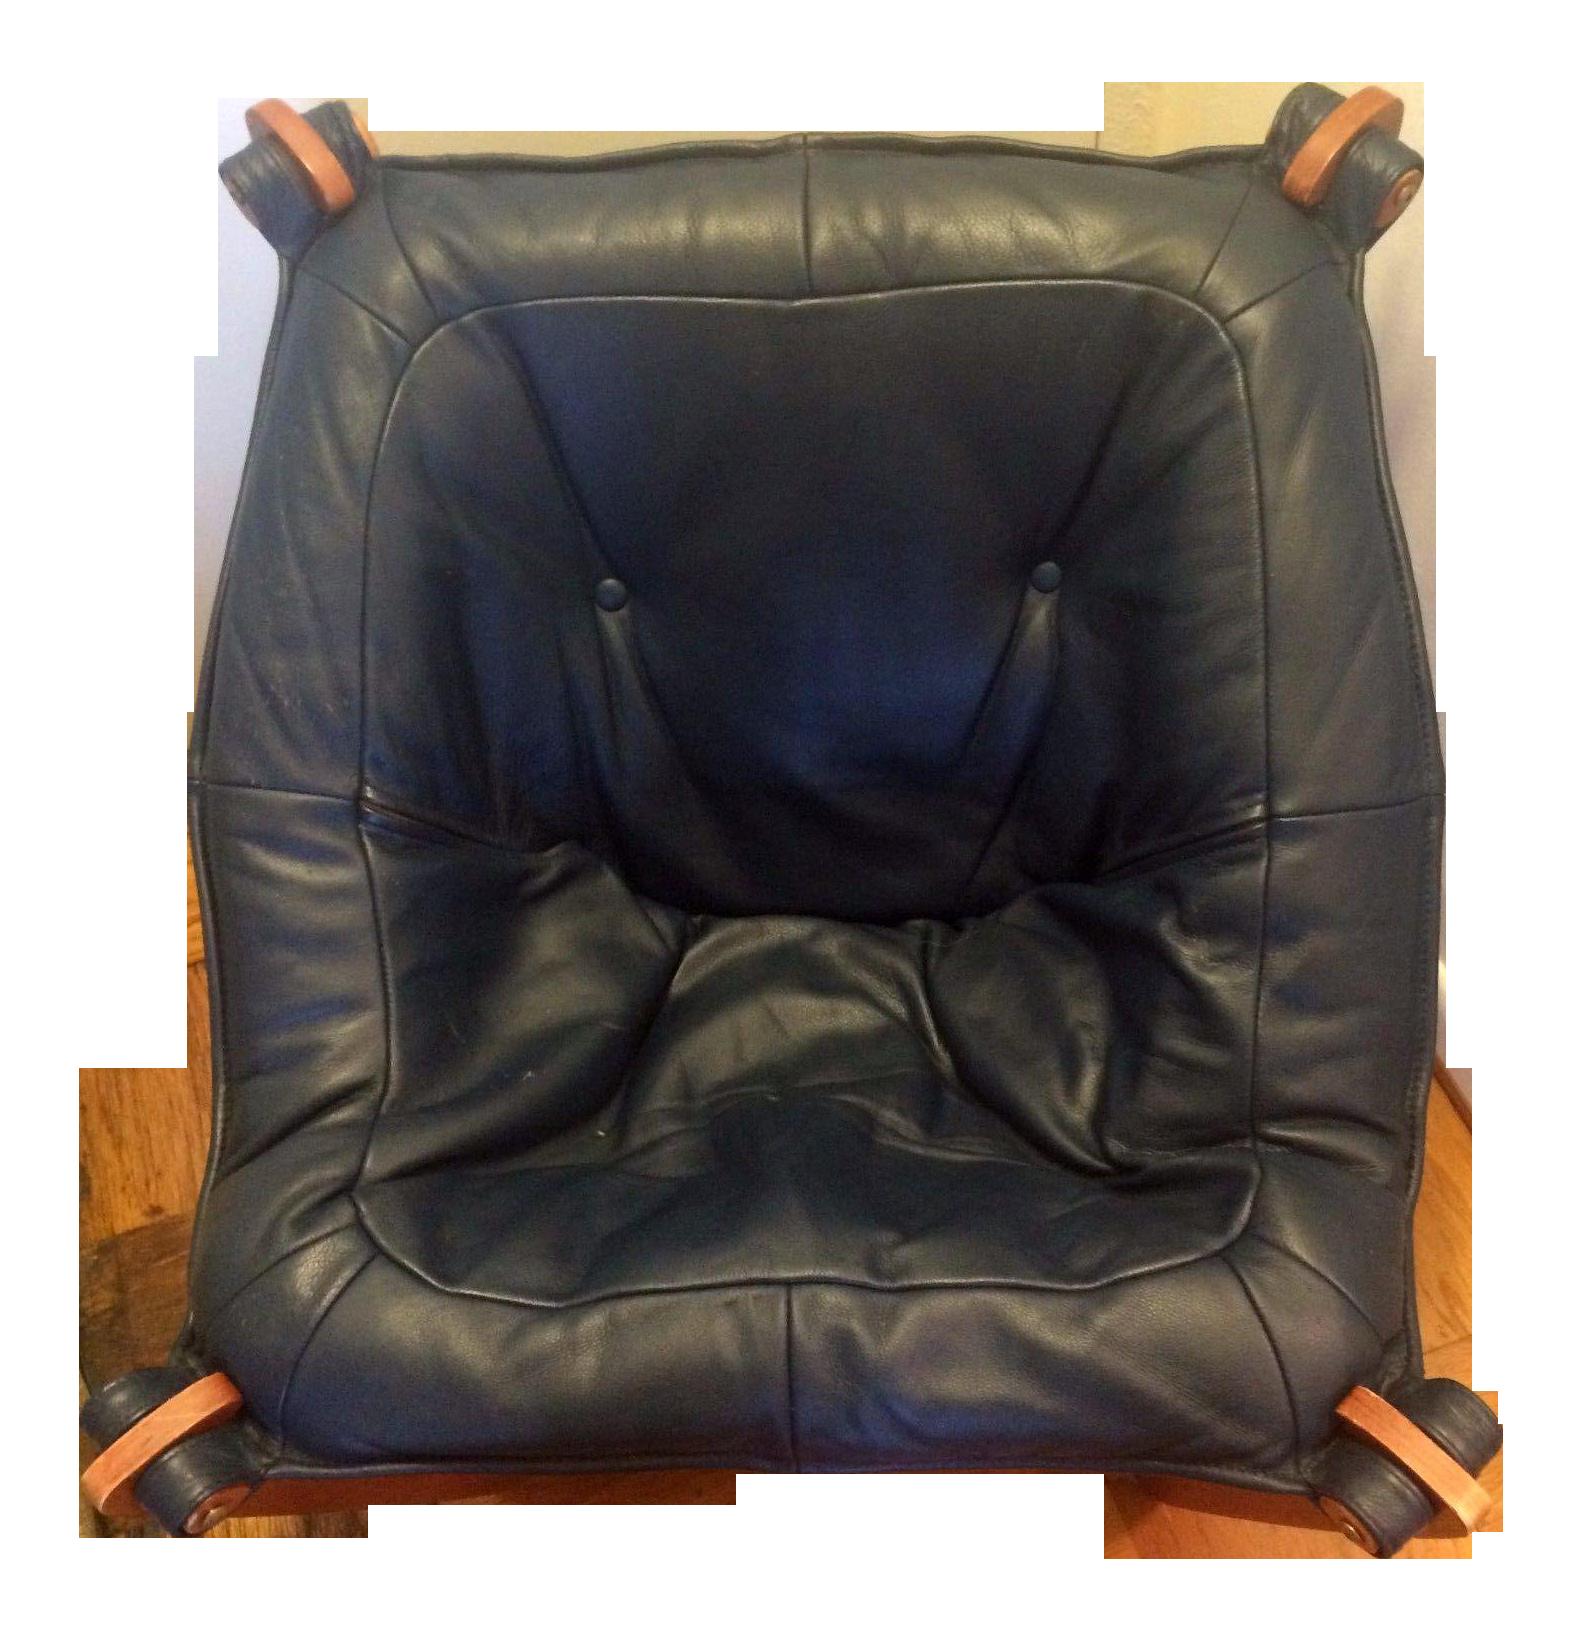 Vintage Luna Mid Century Danish Modern Leather Sling Chair